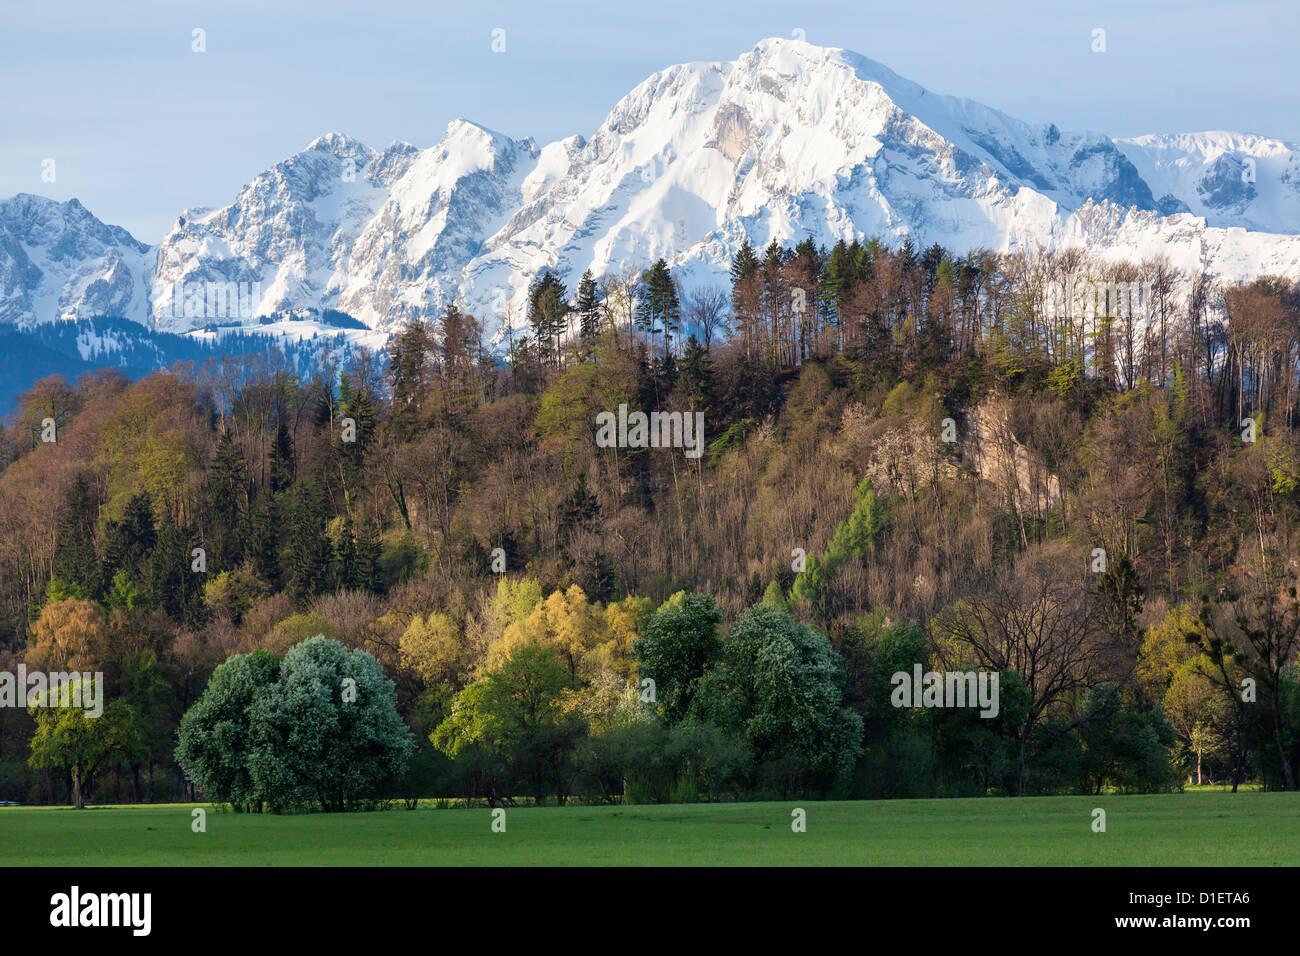 View above the Hellbrunner Berg to Hoher Goell, Berchtesgaden Alps Stock Photo